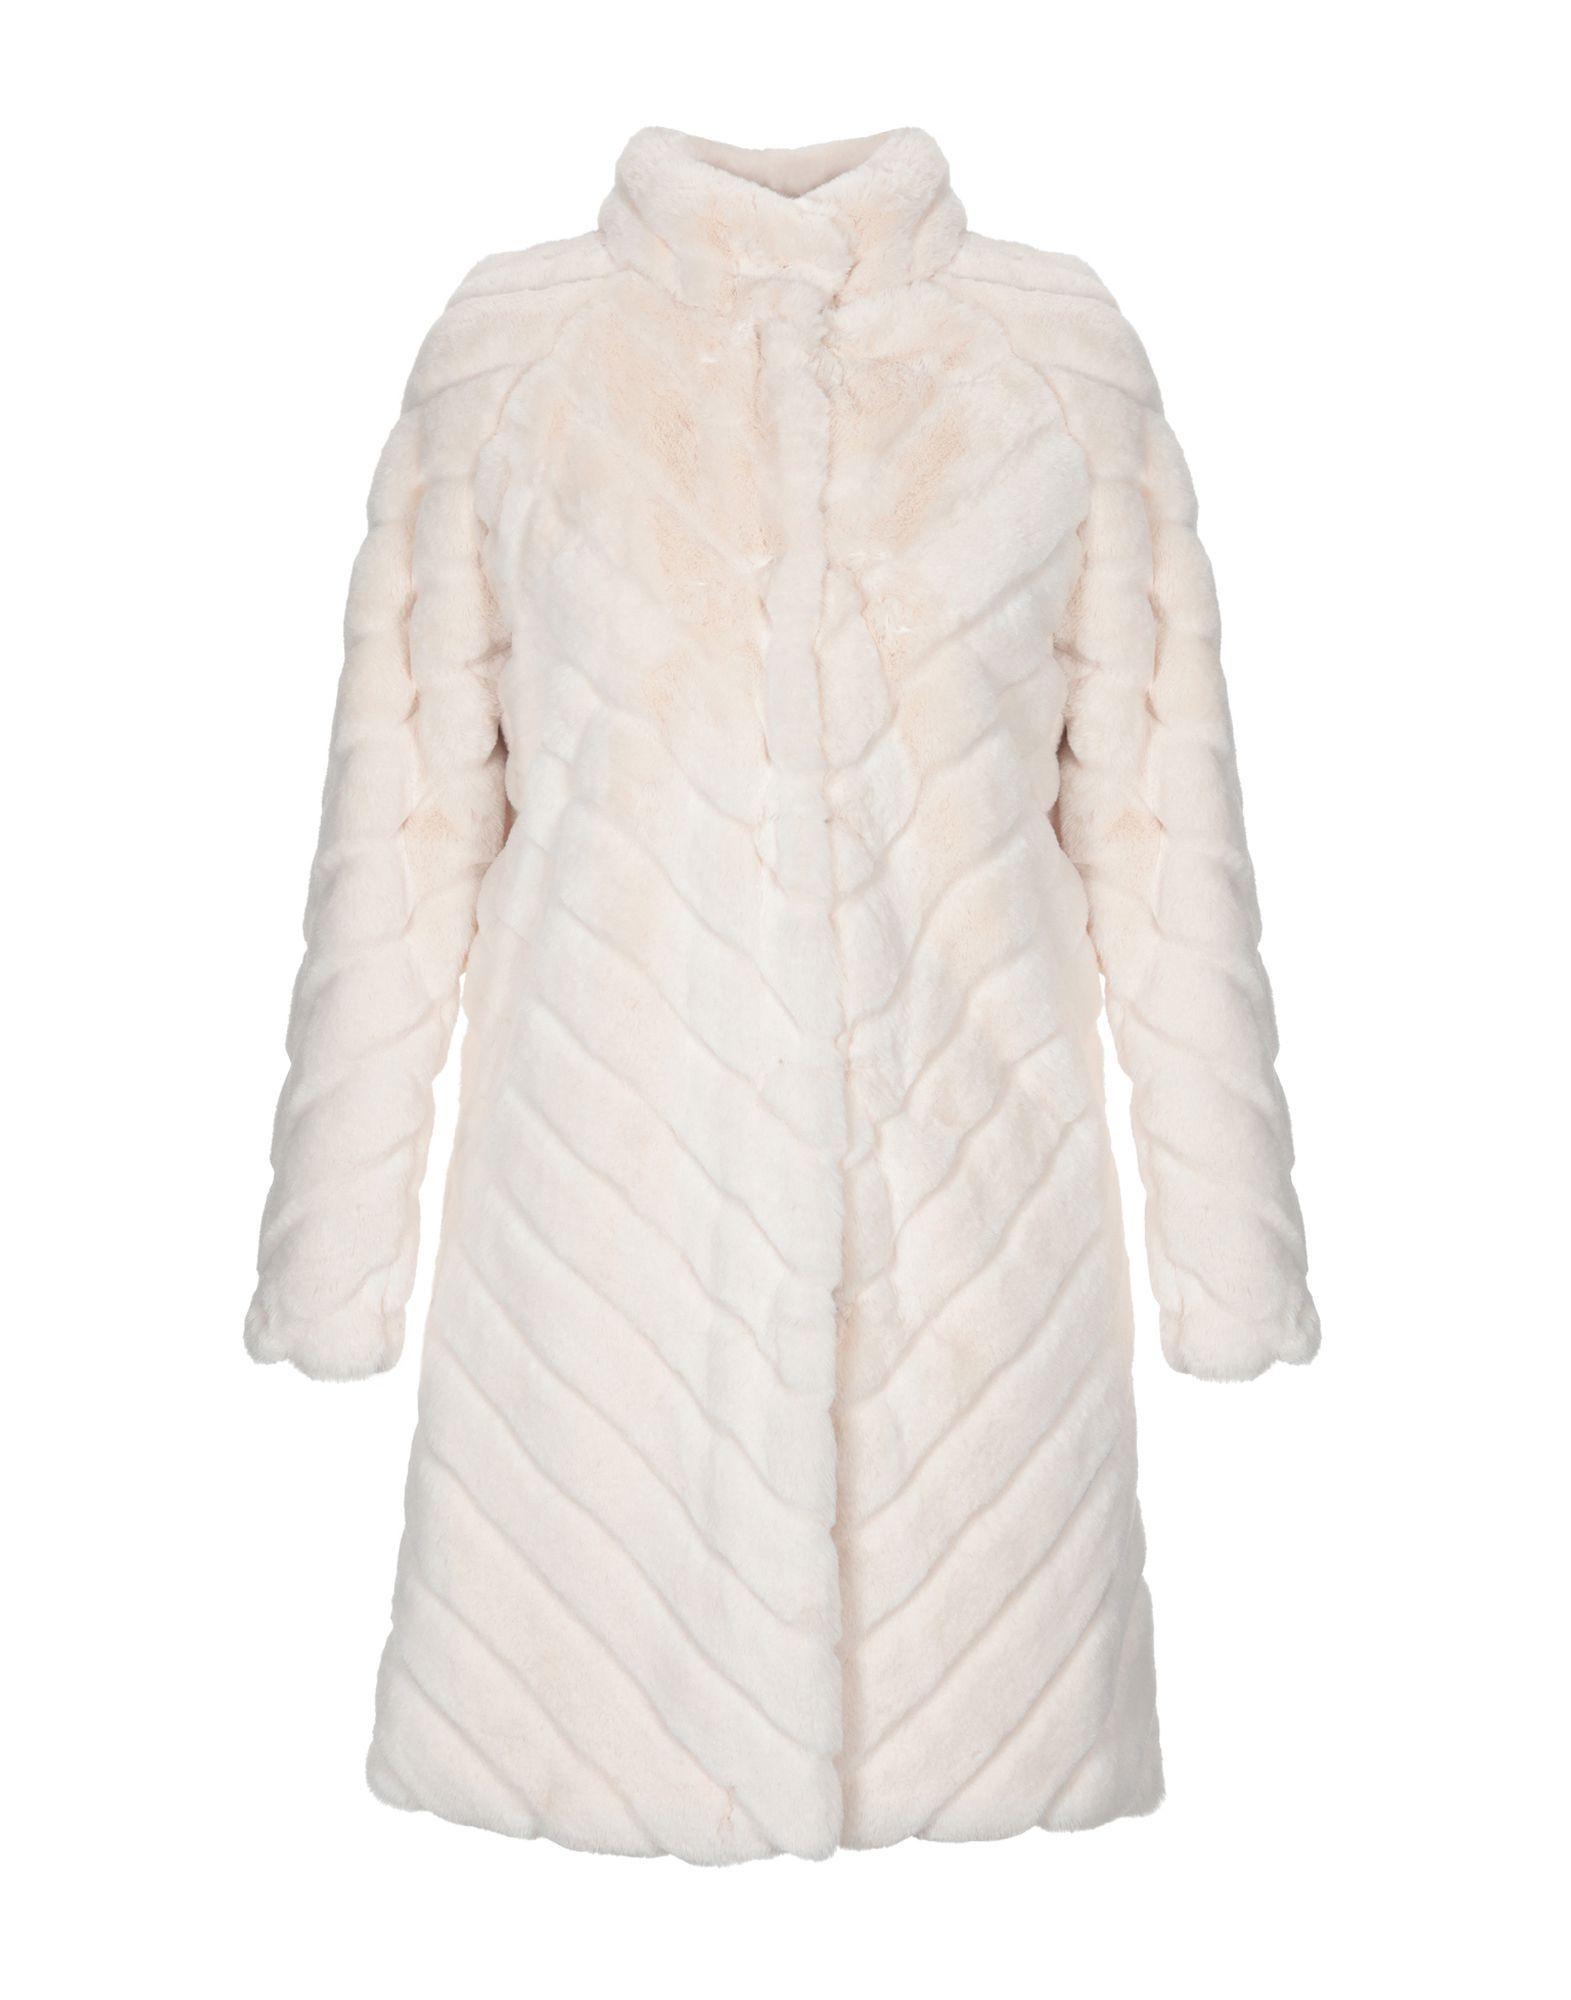 Twinset Ivory Faux Fur Coat